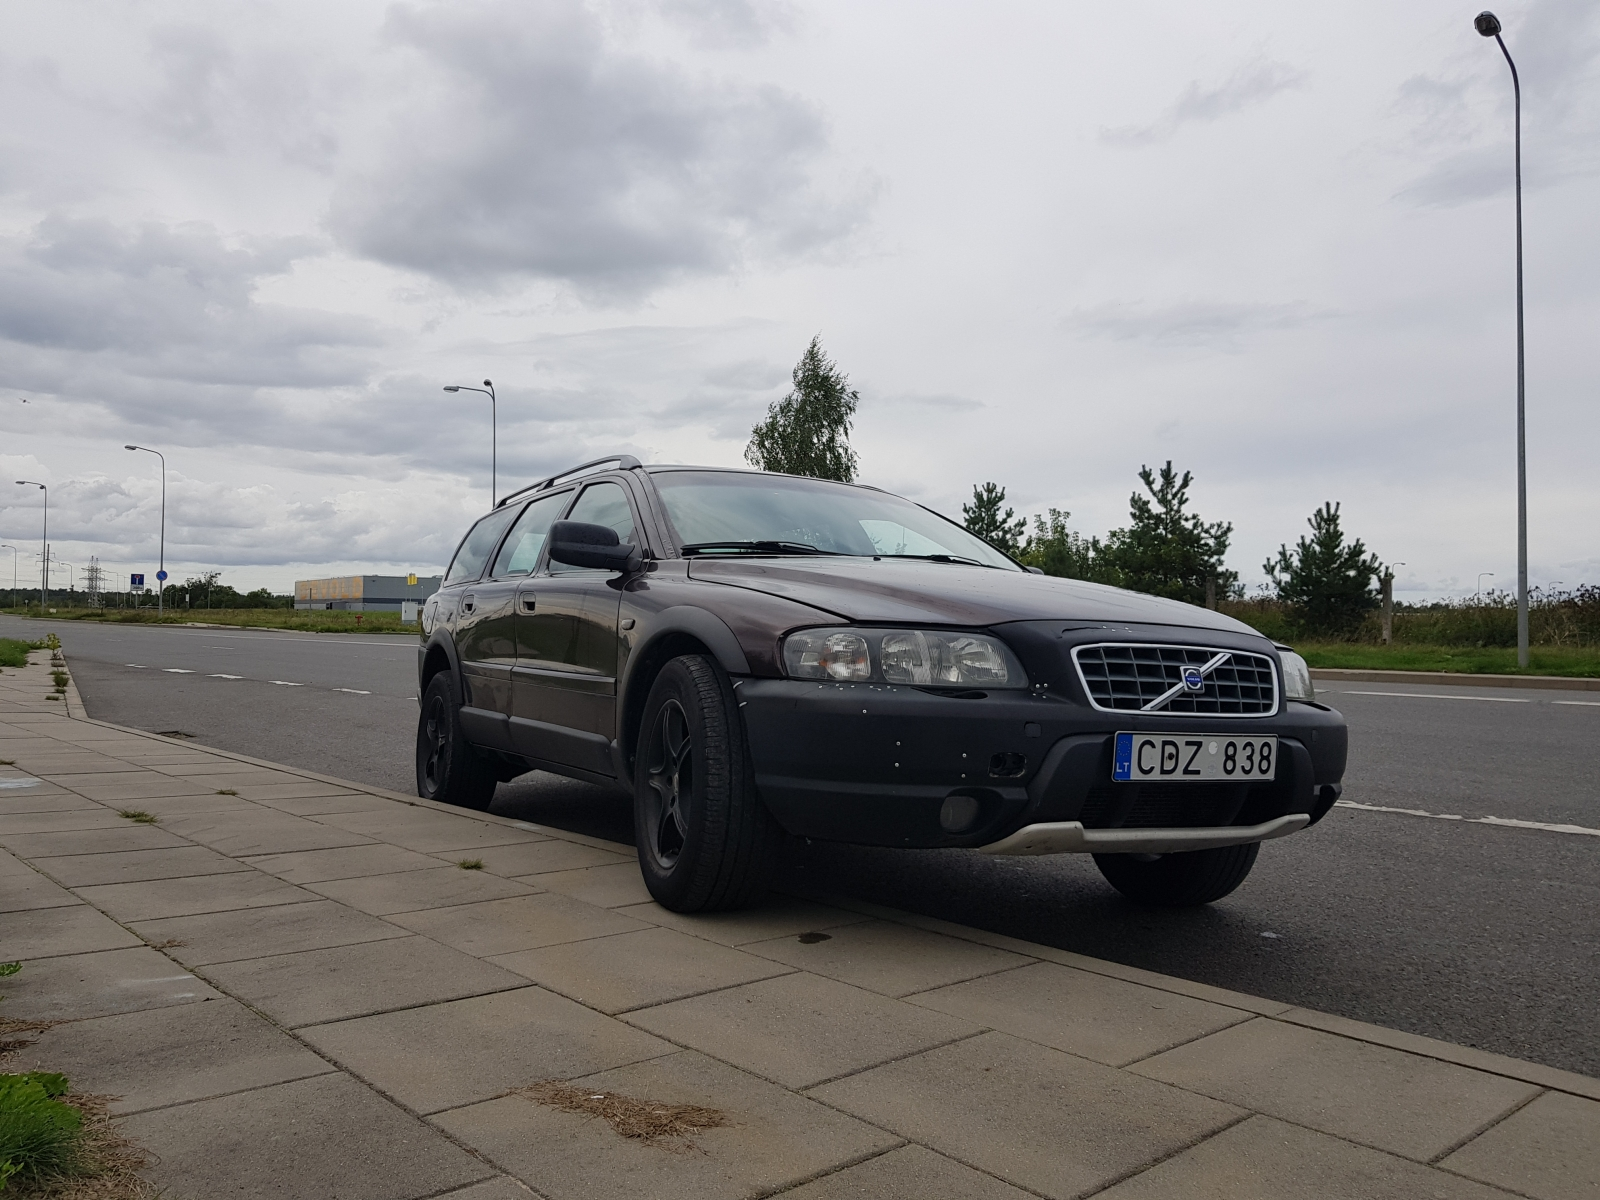 Volvo XC70 2 generation wagon | Autoa.lt